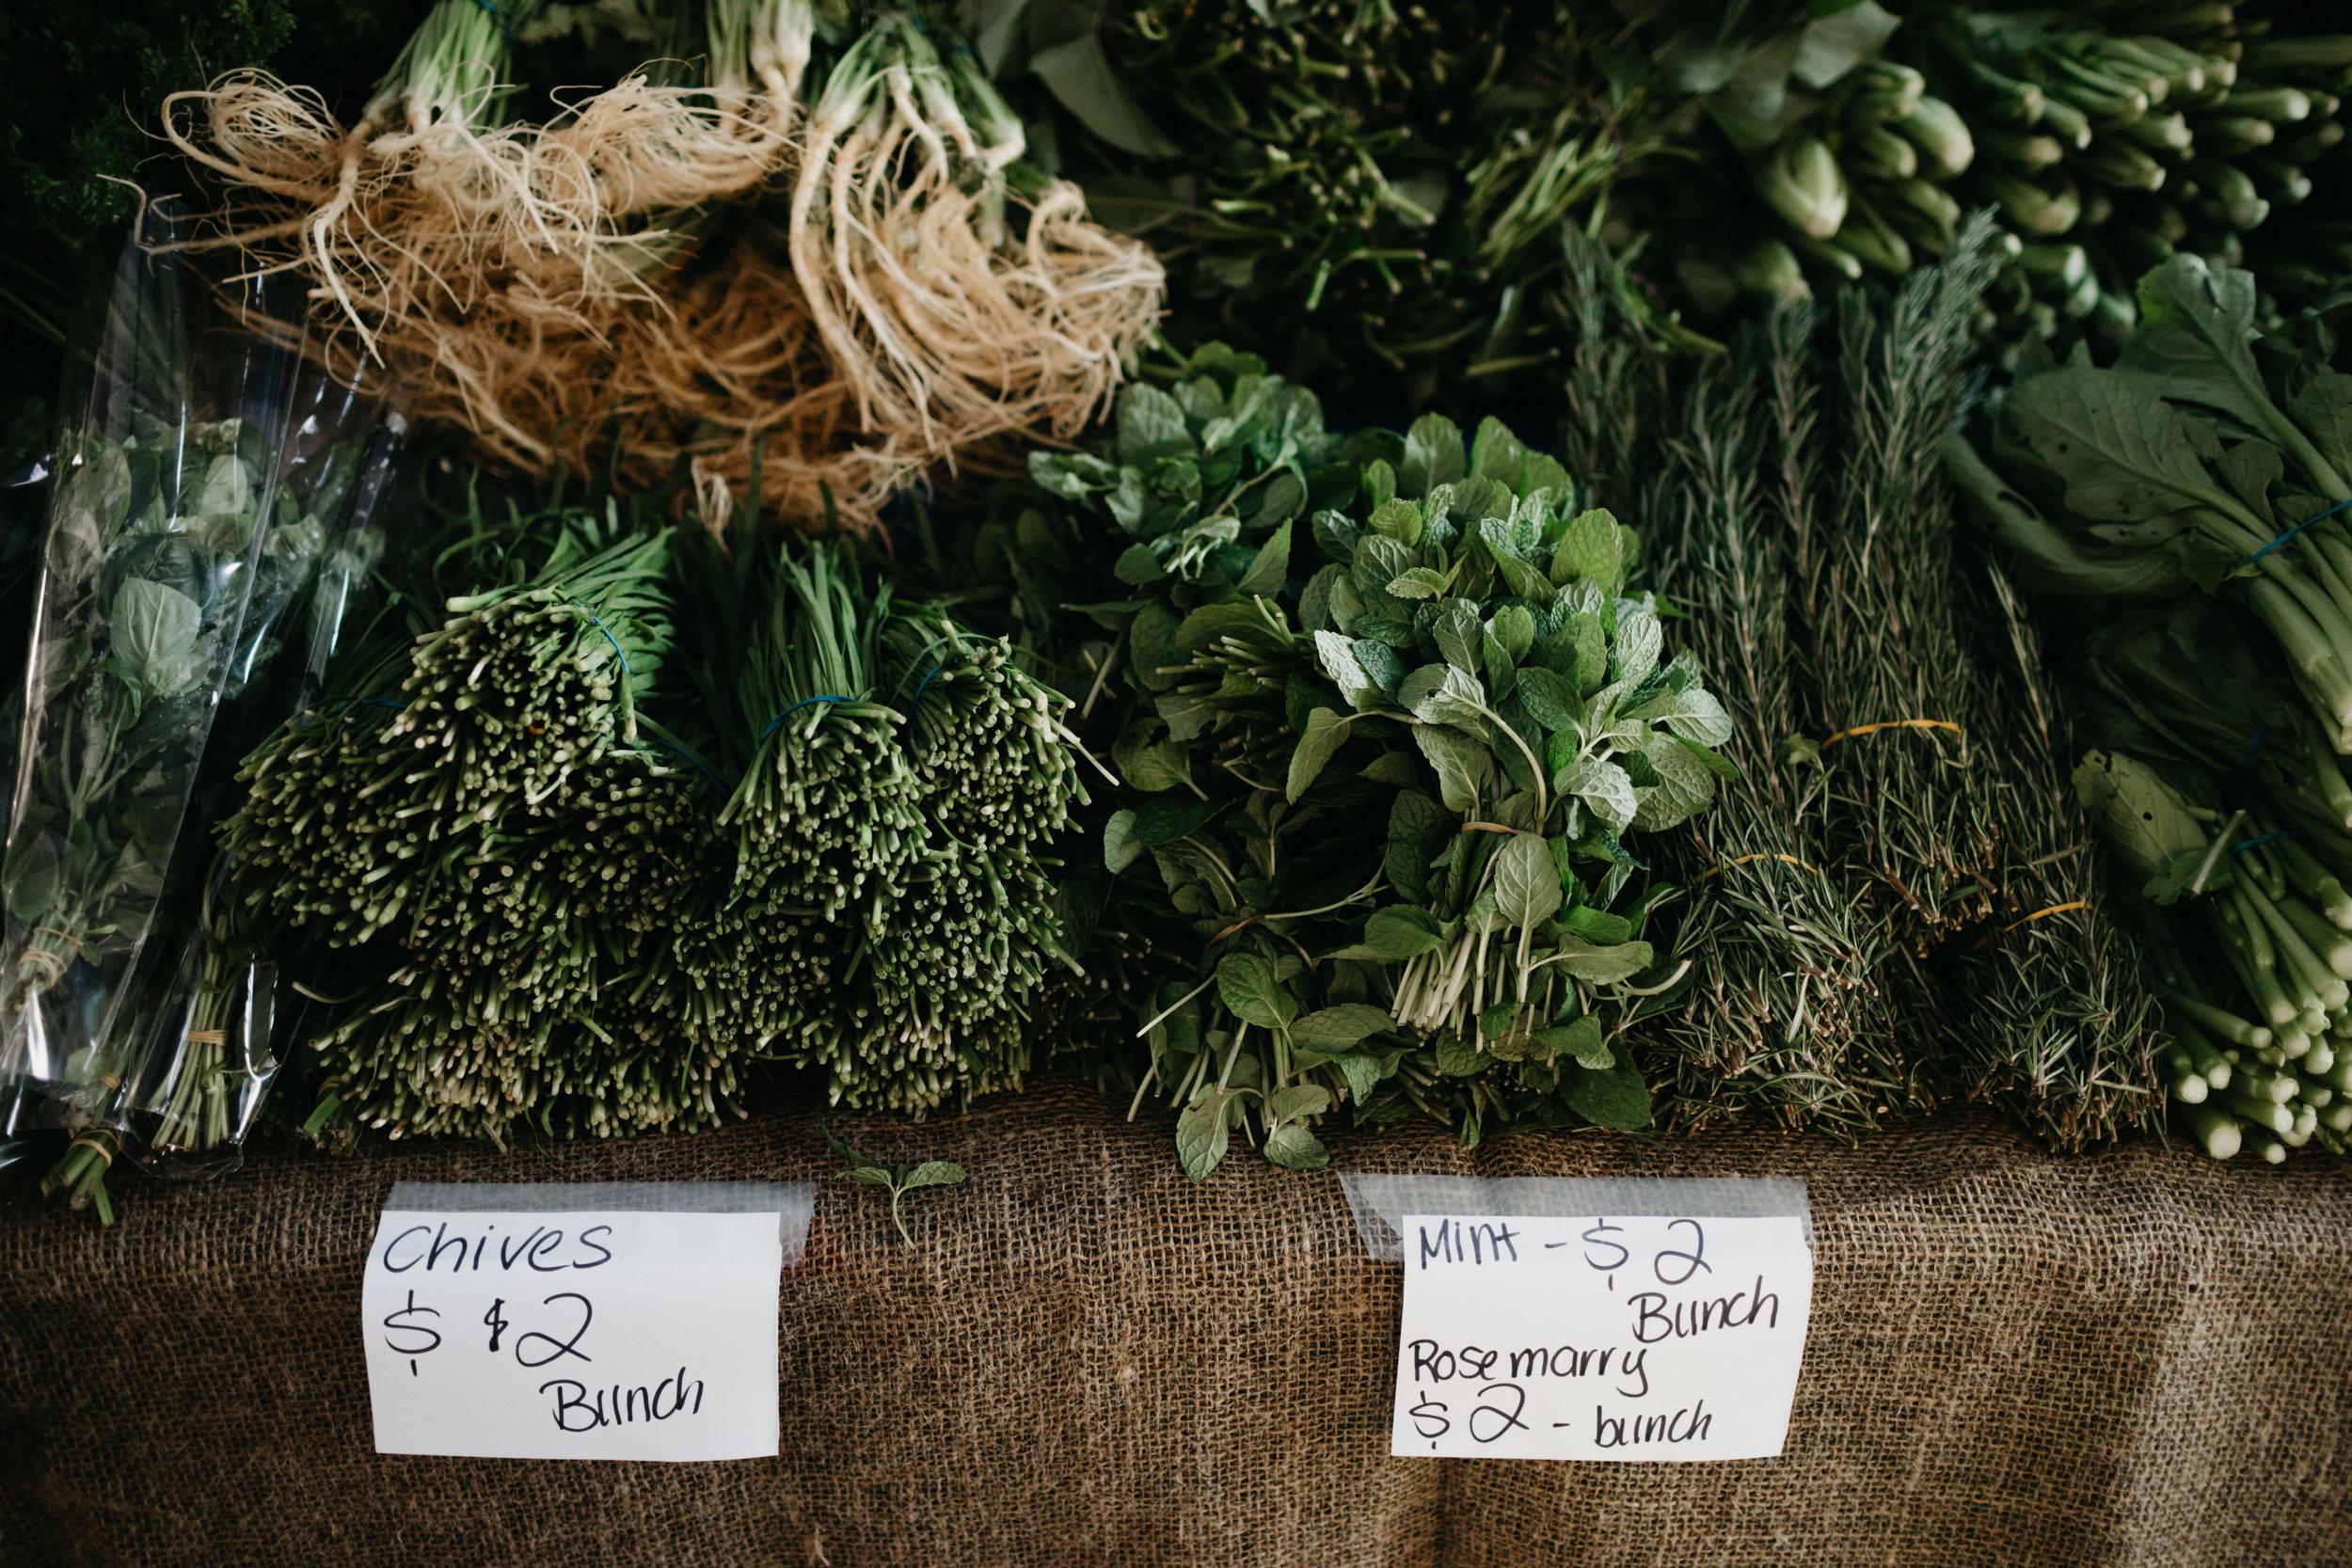 brisbane_farmers_market_photo_by_samantha_look.jpg